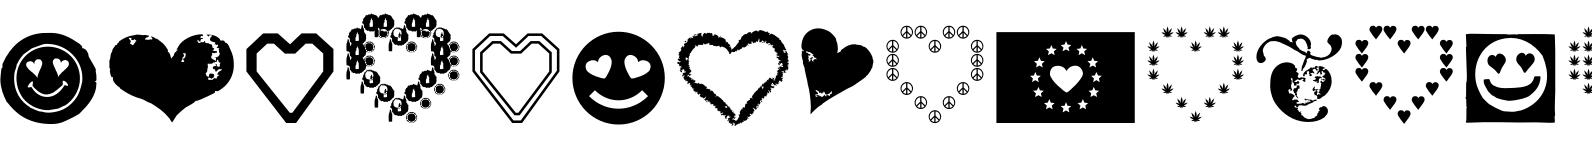 Hearts Love Smile